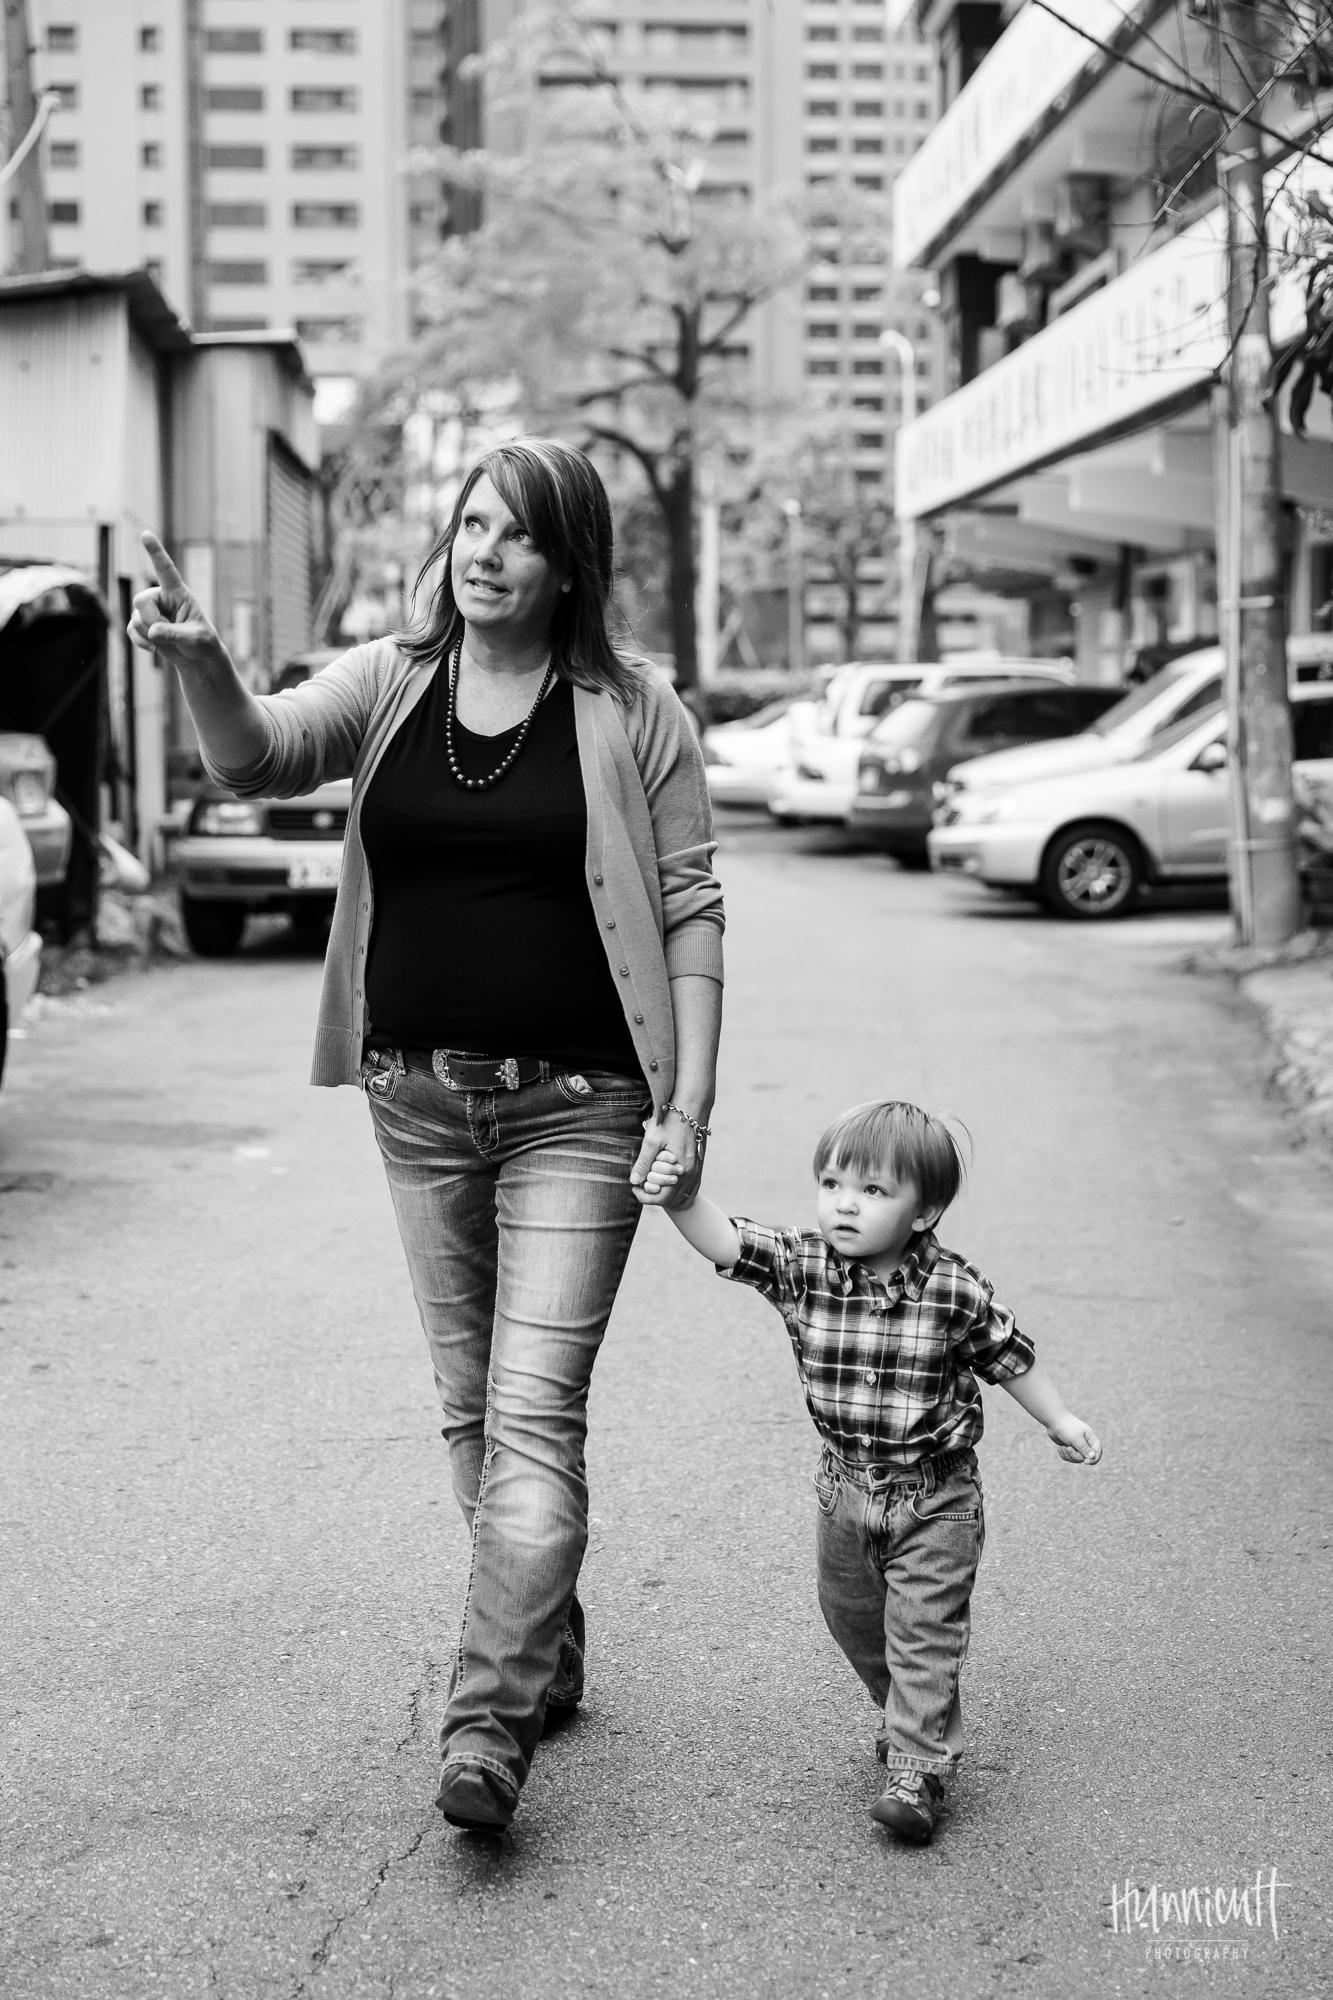 Outdoor-Modern-Urban-Family-Hunnicutt-Photography-Rebecca-Hunnicutt-Farren-Taichung-Taiwan-Exploring-Neighborhood-14